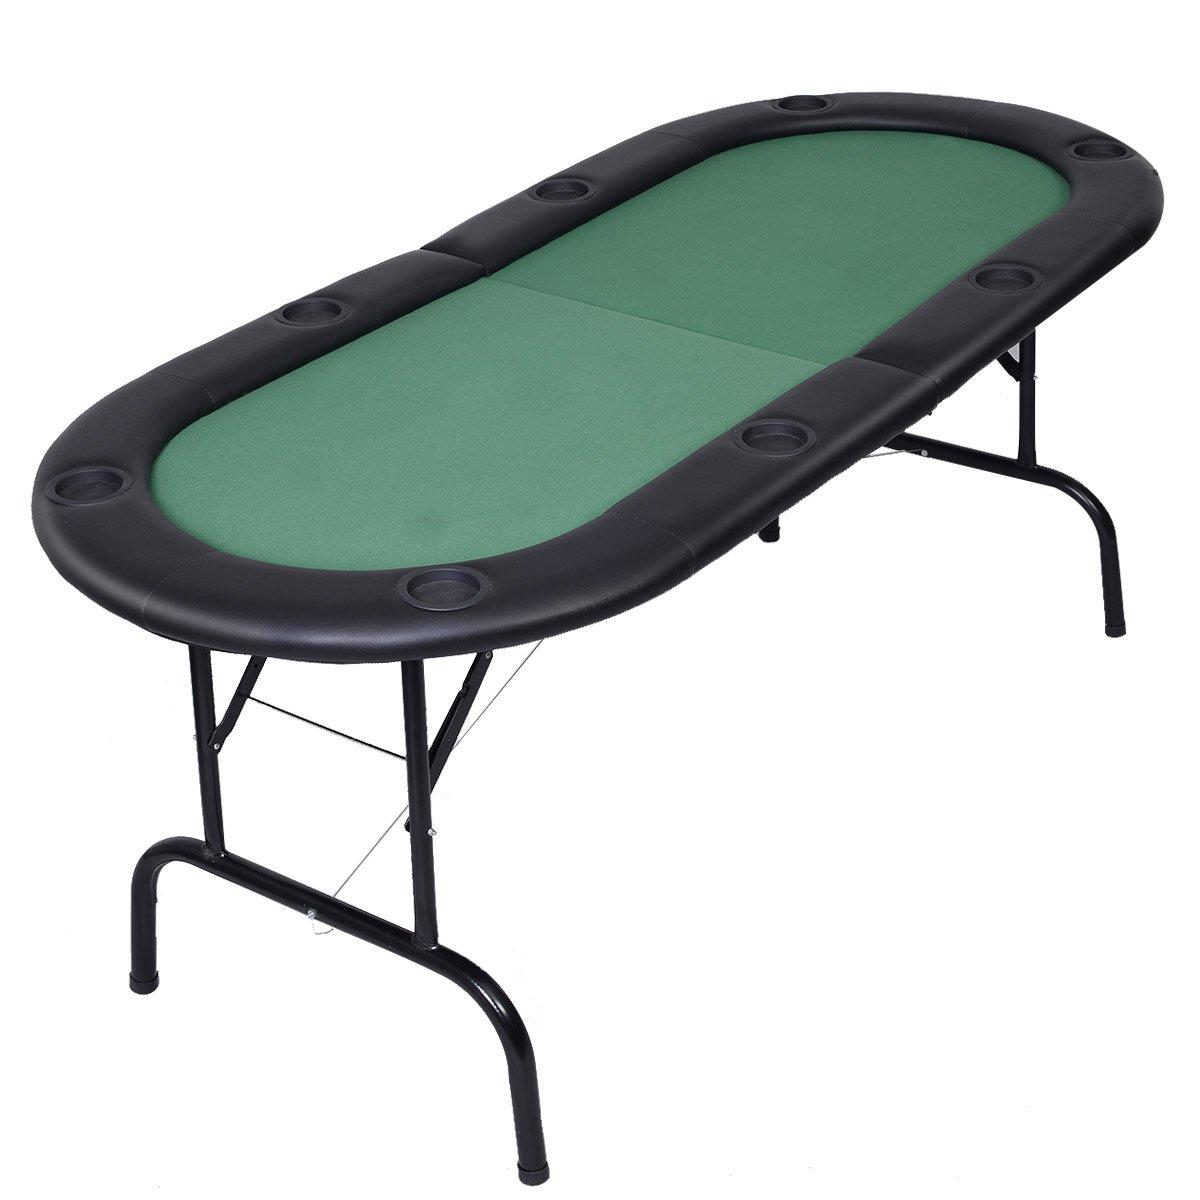 Giantex Foldable 8 Player Poker Table Casino Texas Holdem Folding Poker Play Table